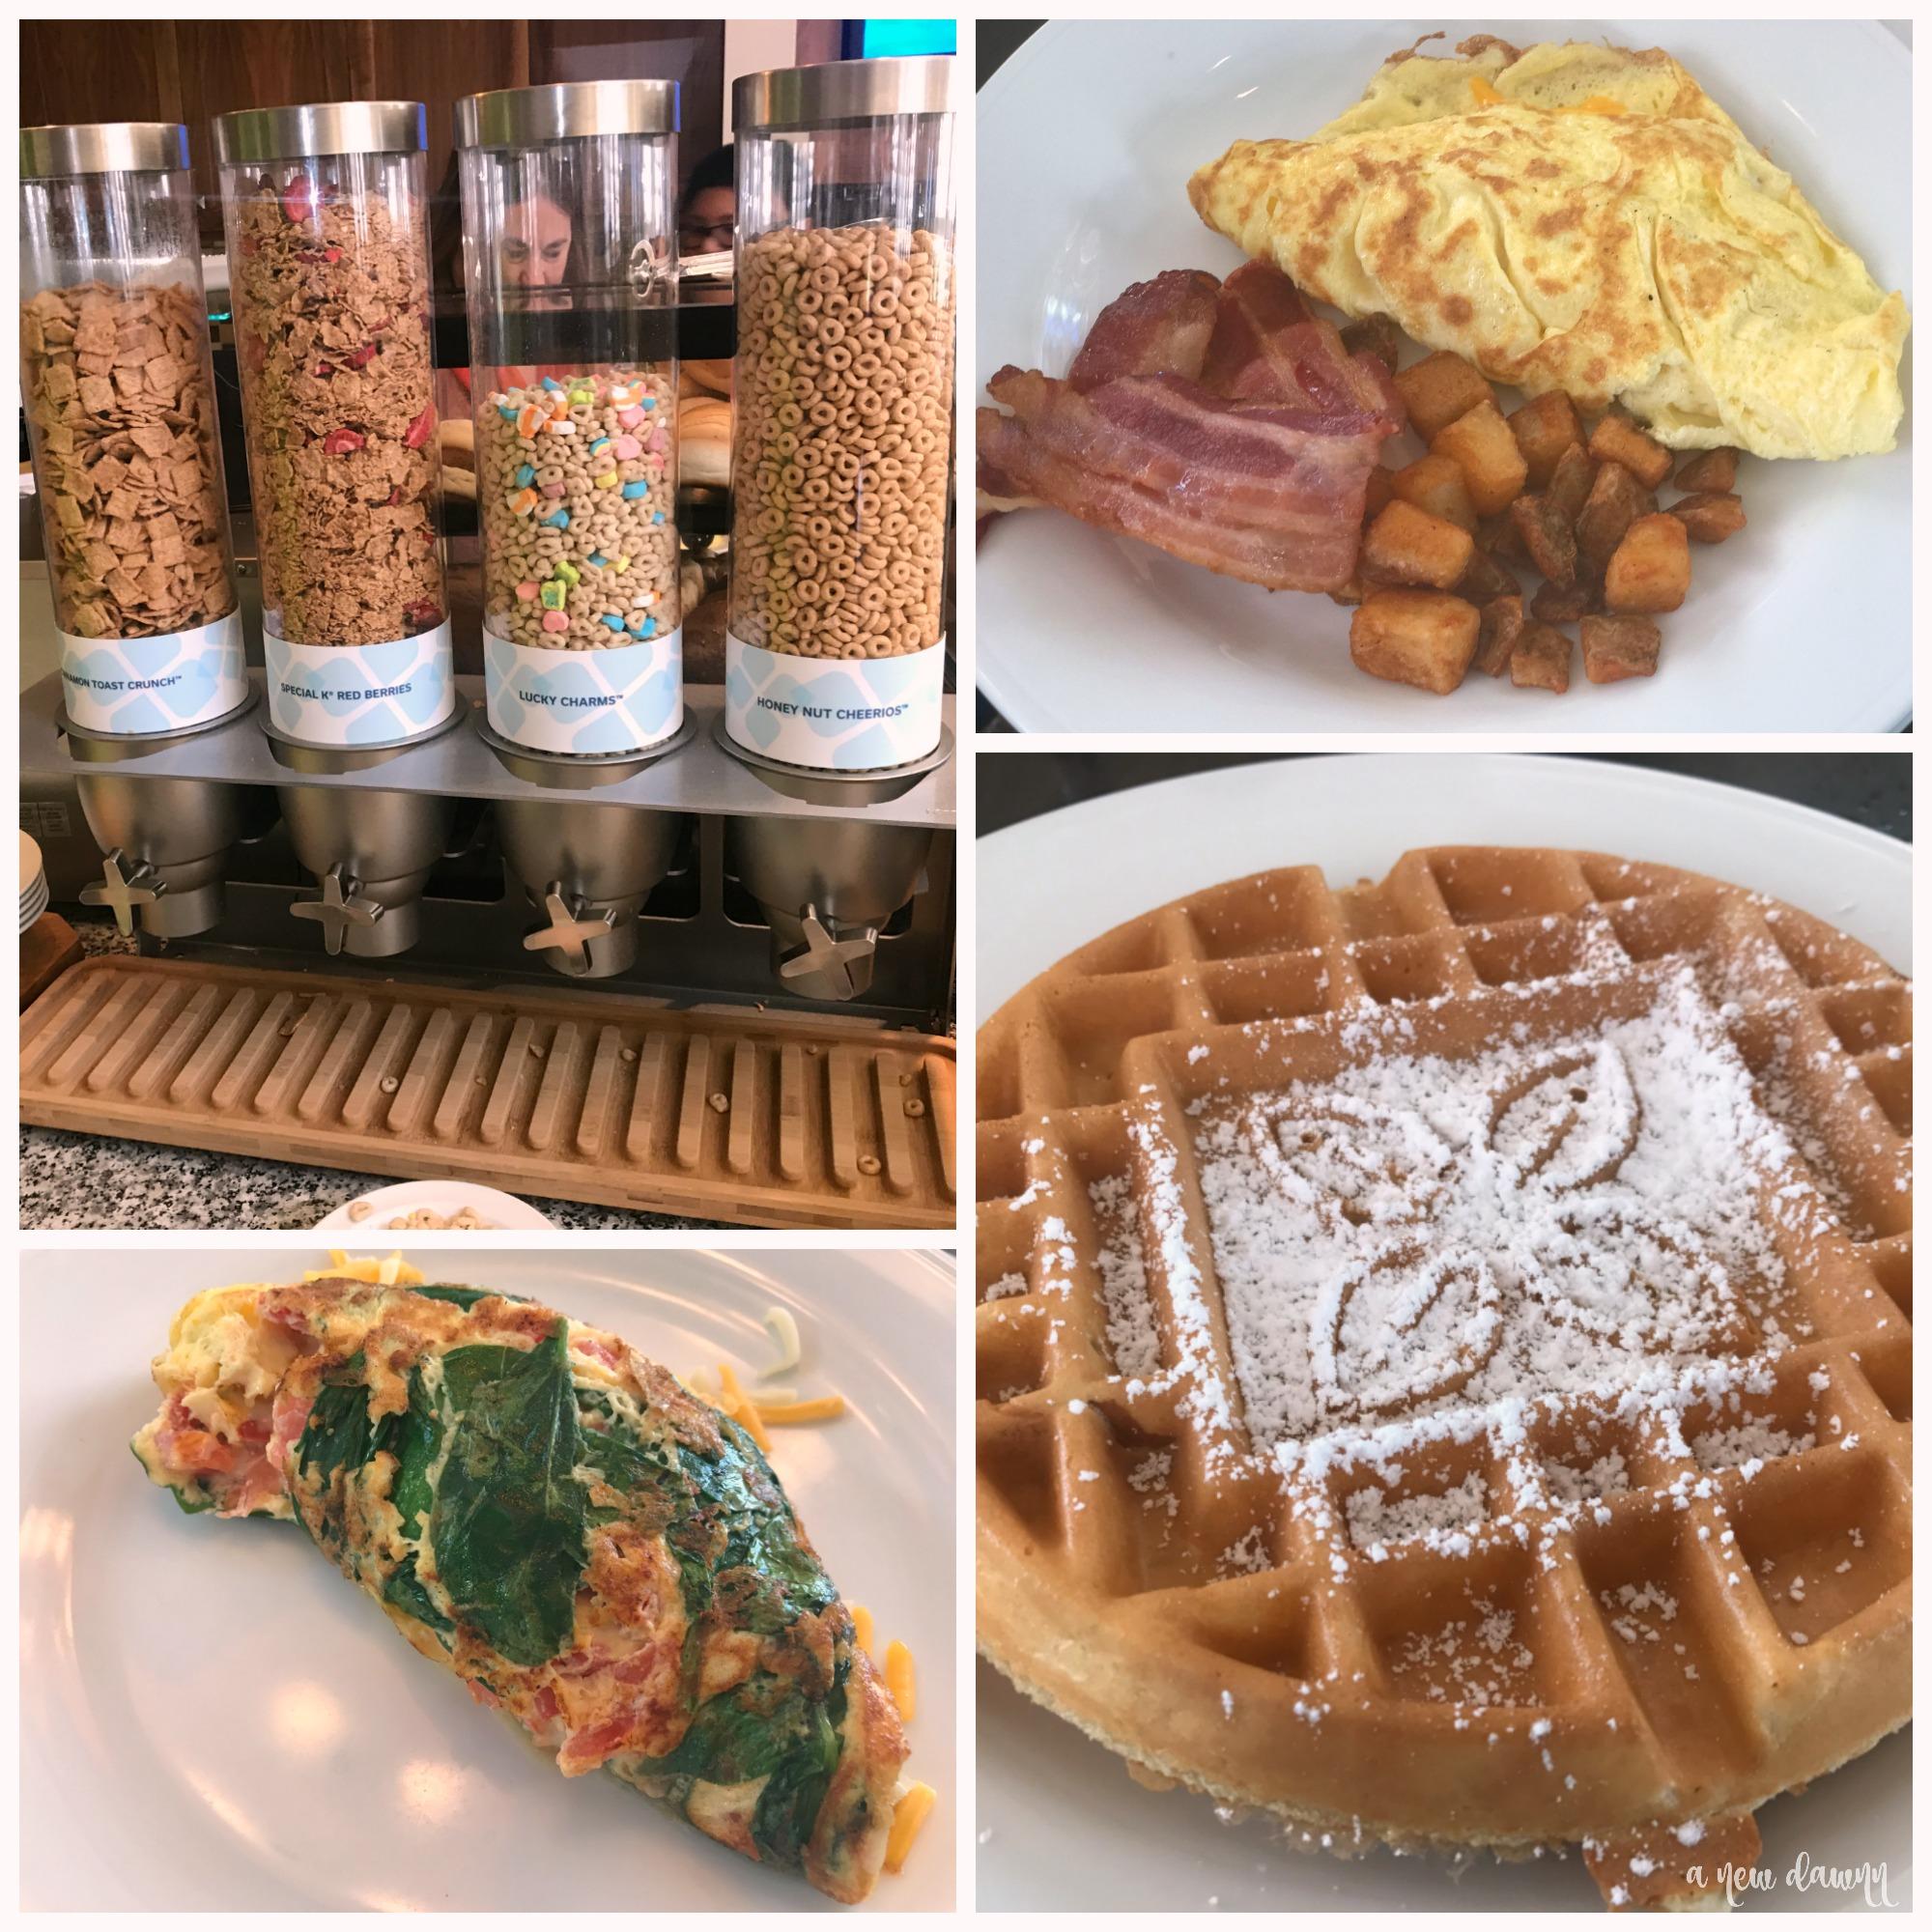 breakfast options at the Hilton Garden Inn Hershey Hotel